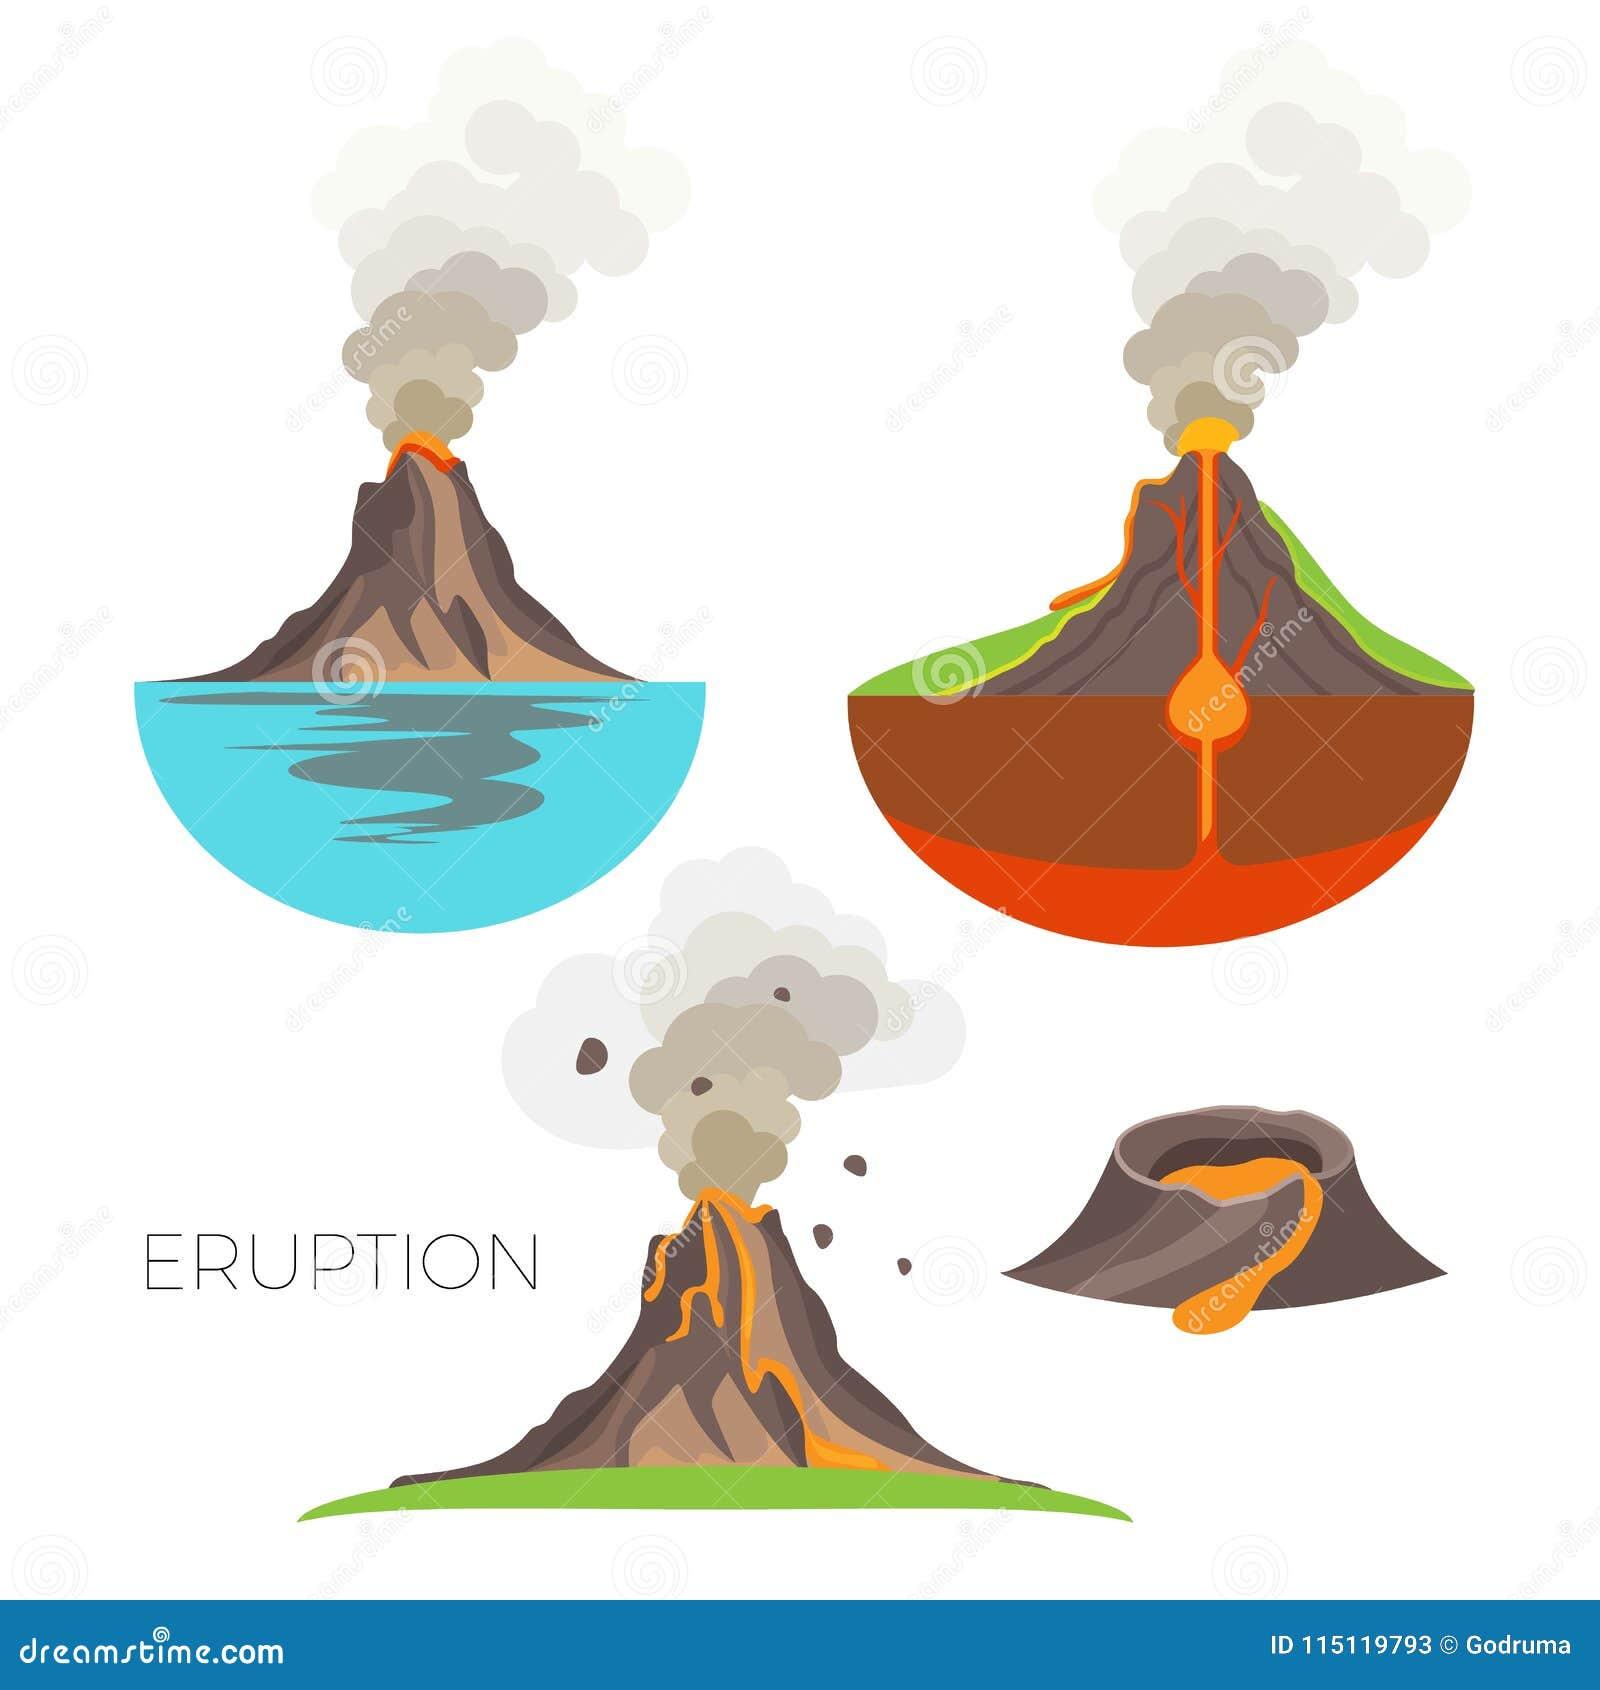 Vulkaanuitbarsting met hete lava en donkere rook